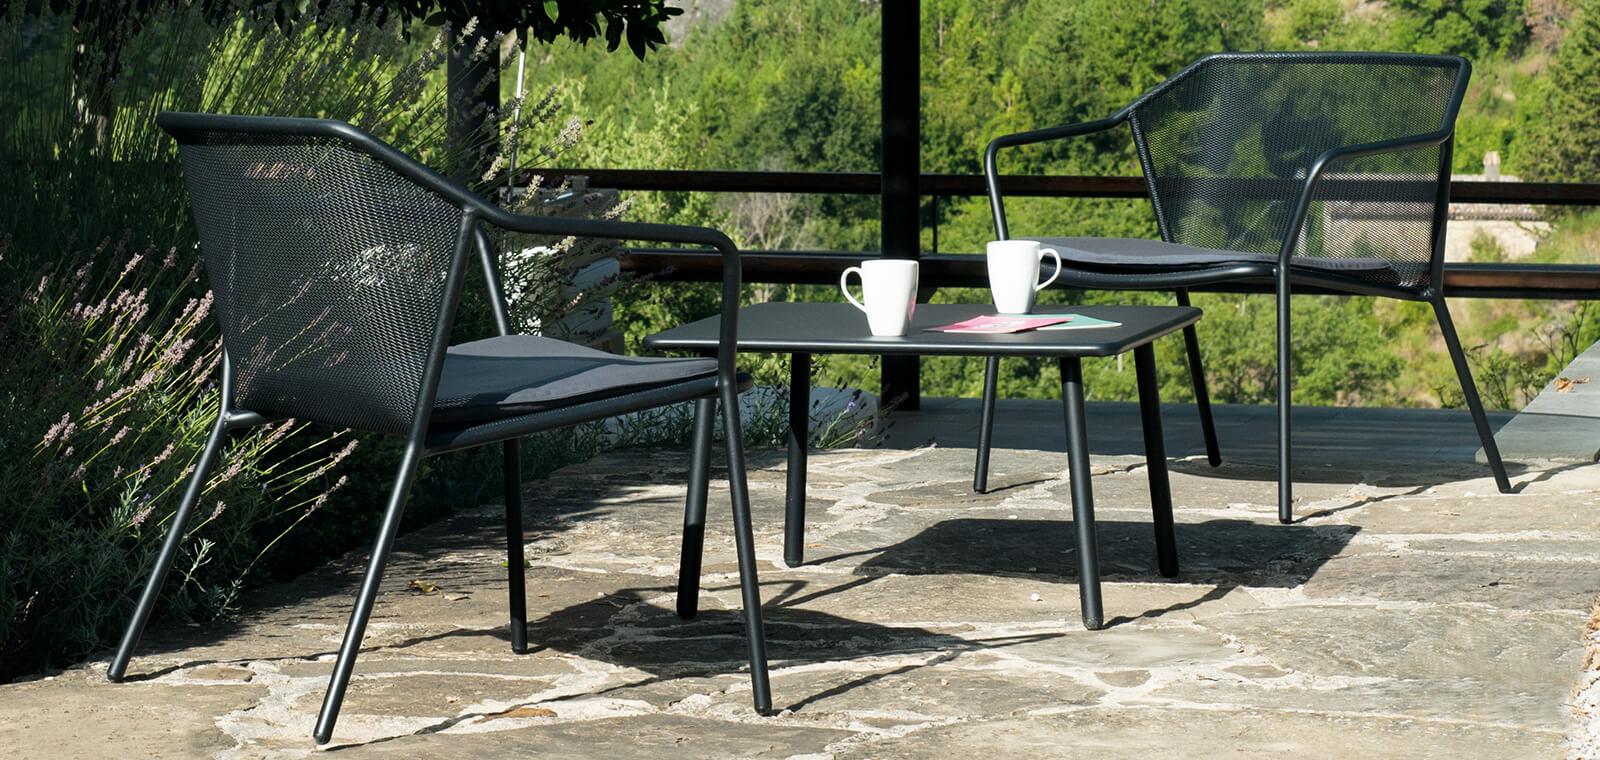 Arredo giardino tps2 tende da sole genova portofino for Arredo giardino design on line